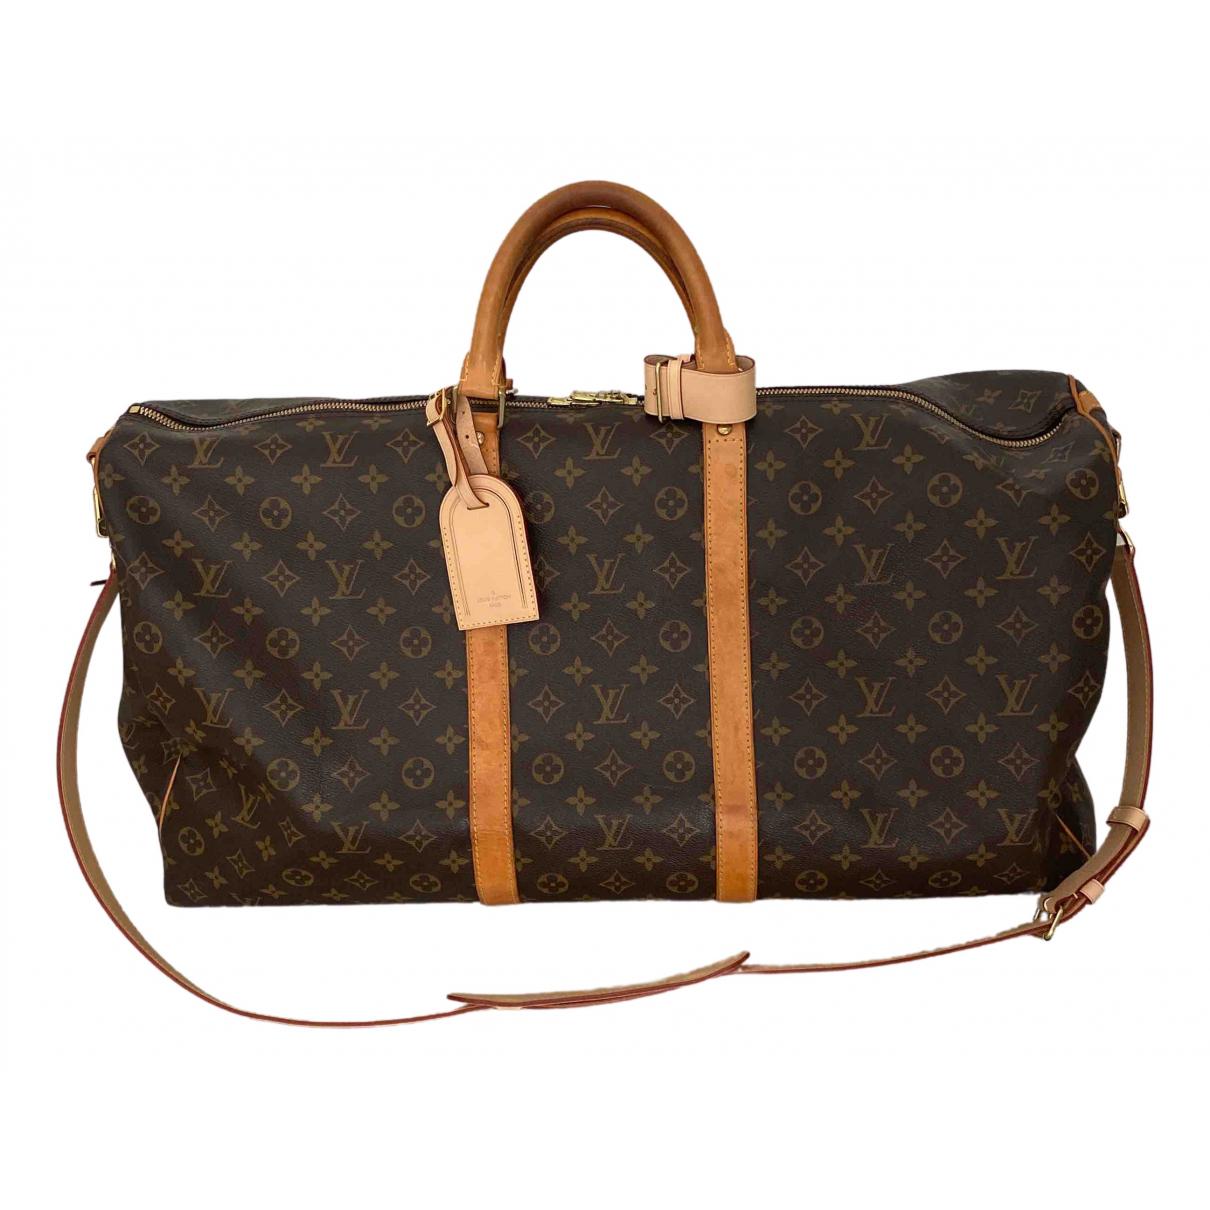 Louis Vuitton - Sac Keepall pour homme en toile - marron